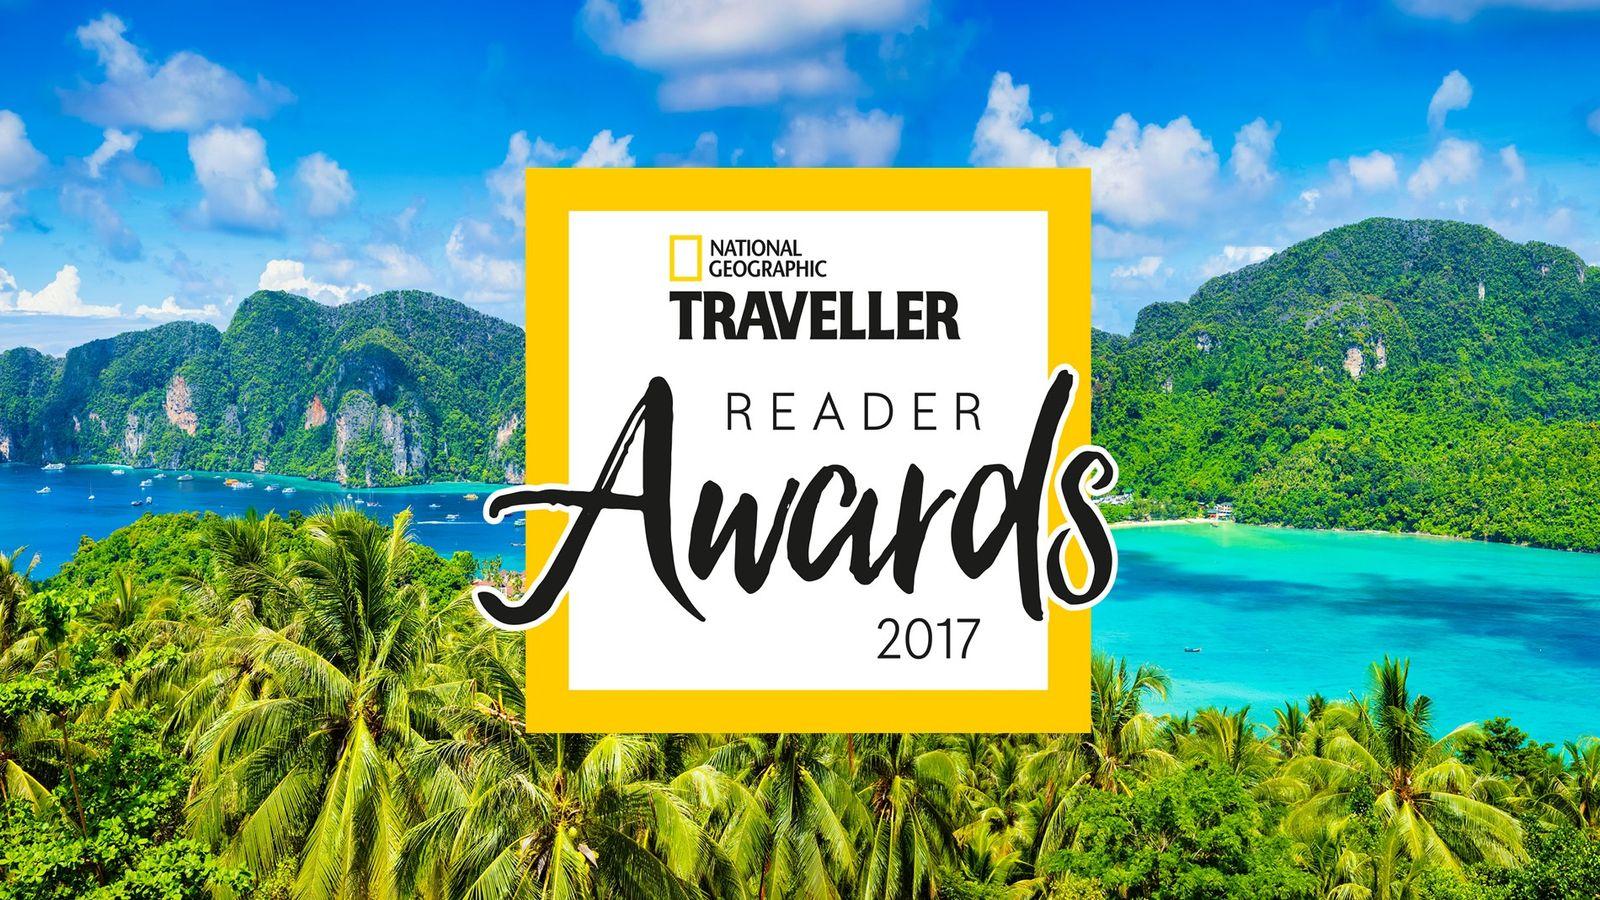 National Geographic Traveller Reader Awards 2017